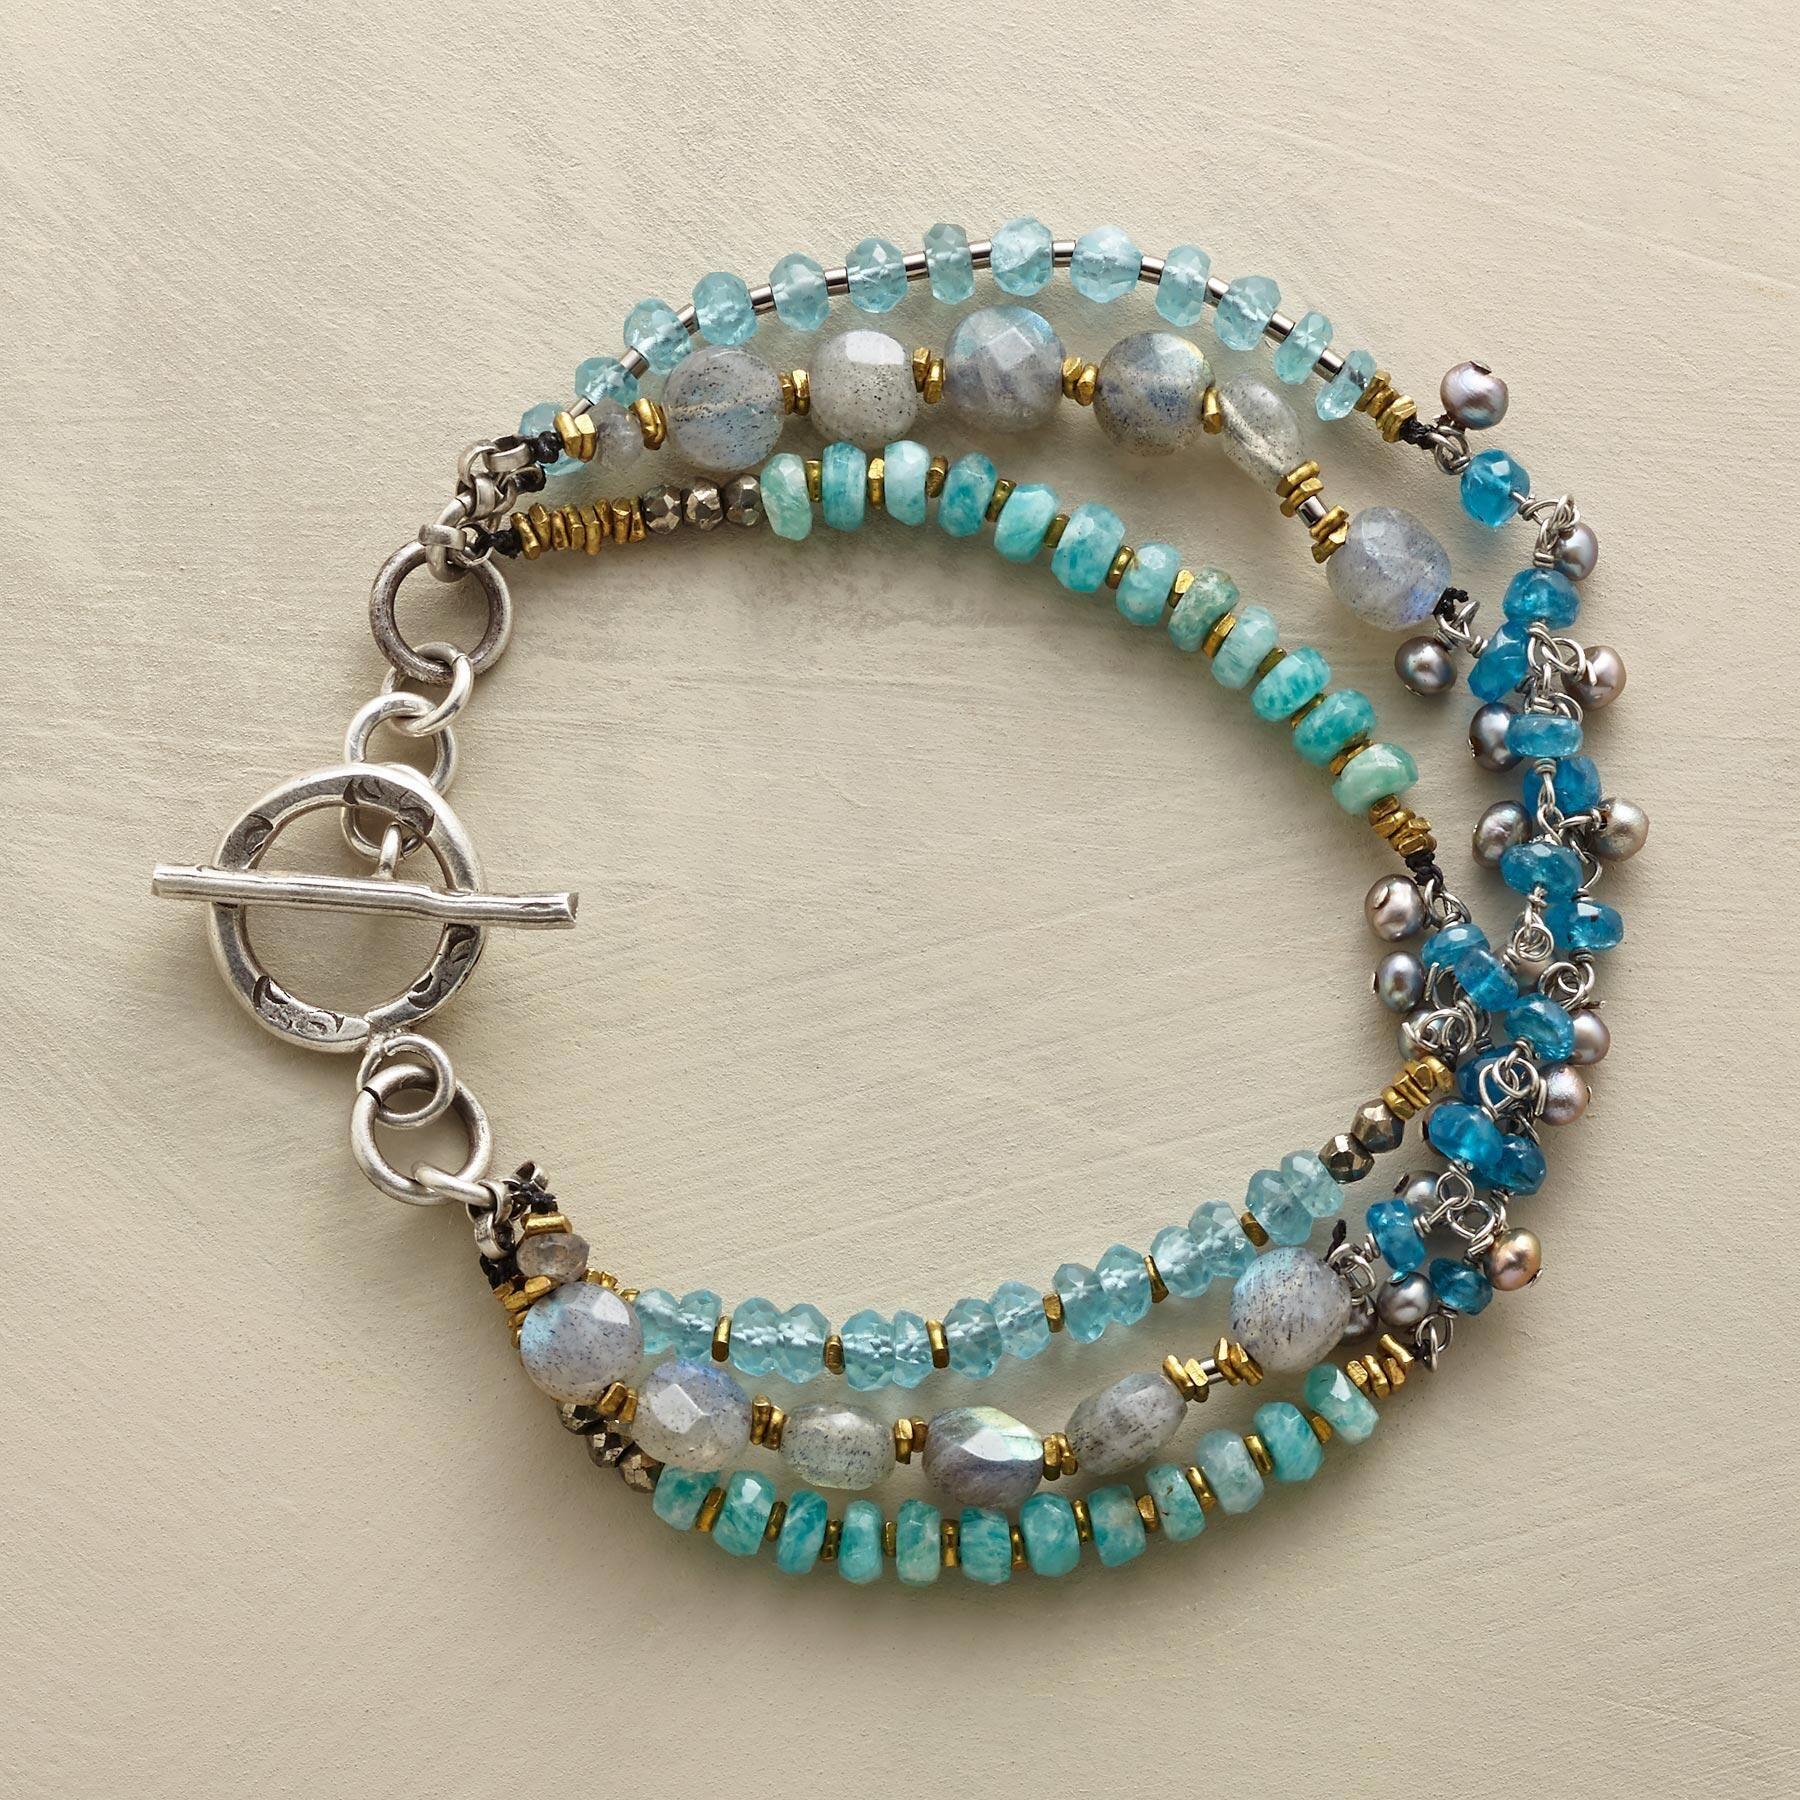 Charm Bracelet Ideas: Best 25+ Bracelet Designs Ideas On Pinterest